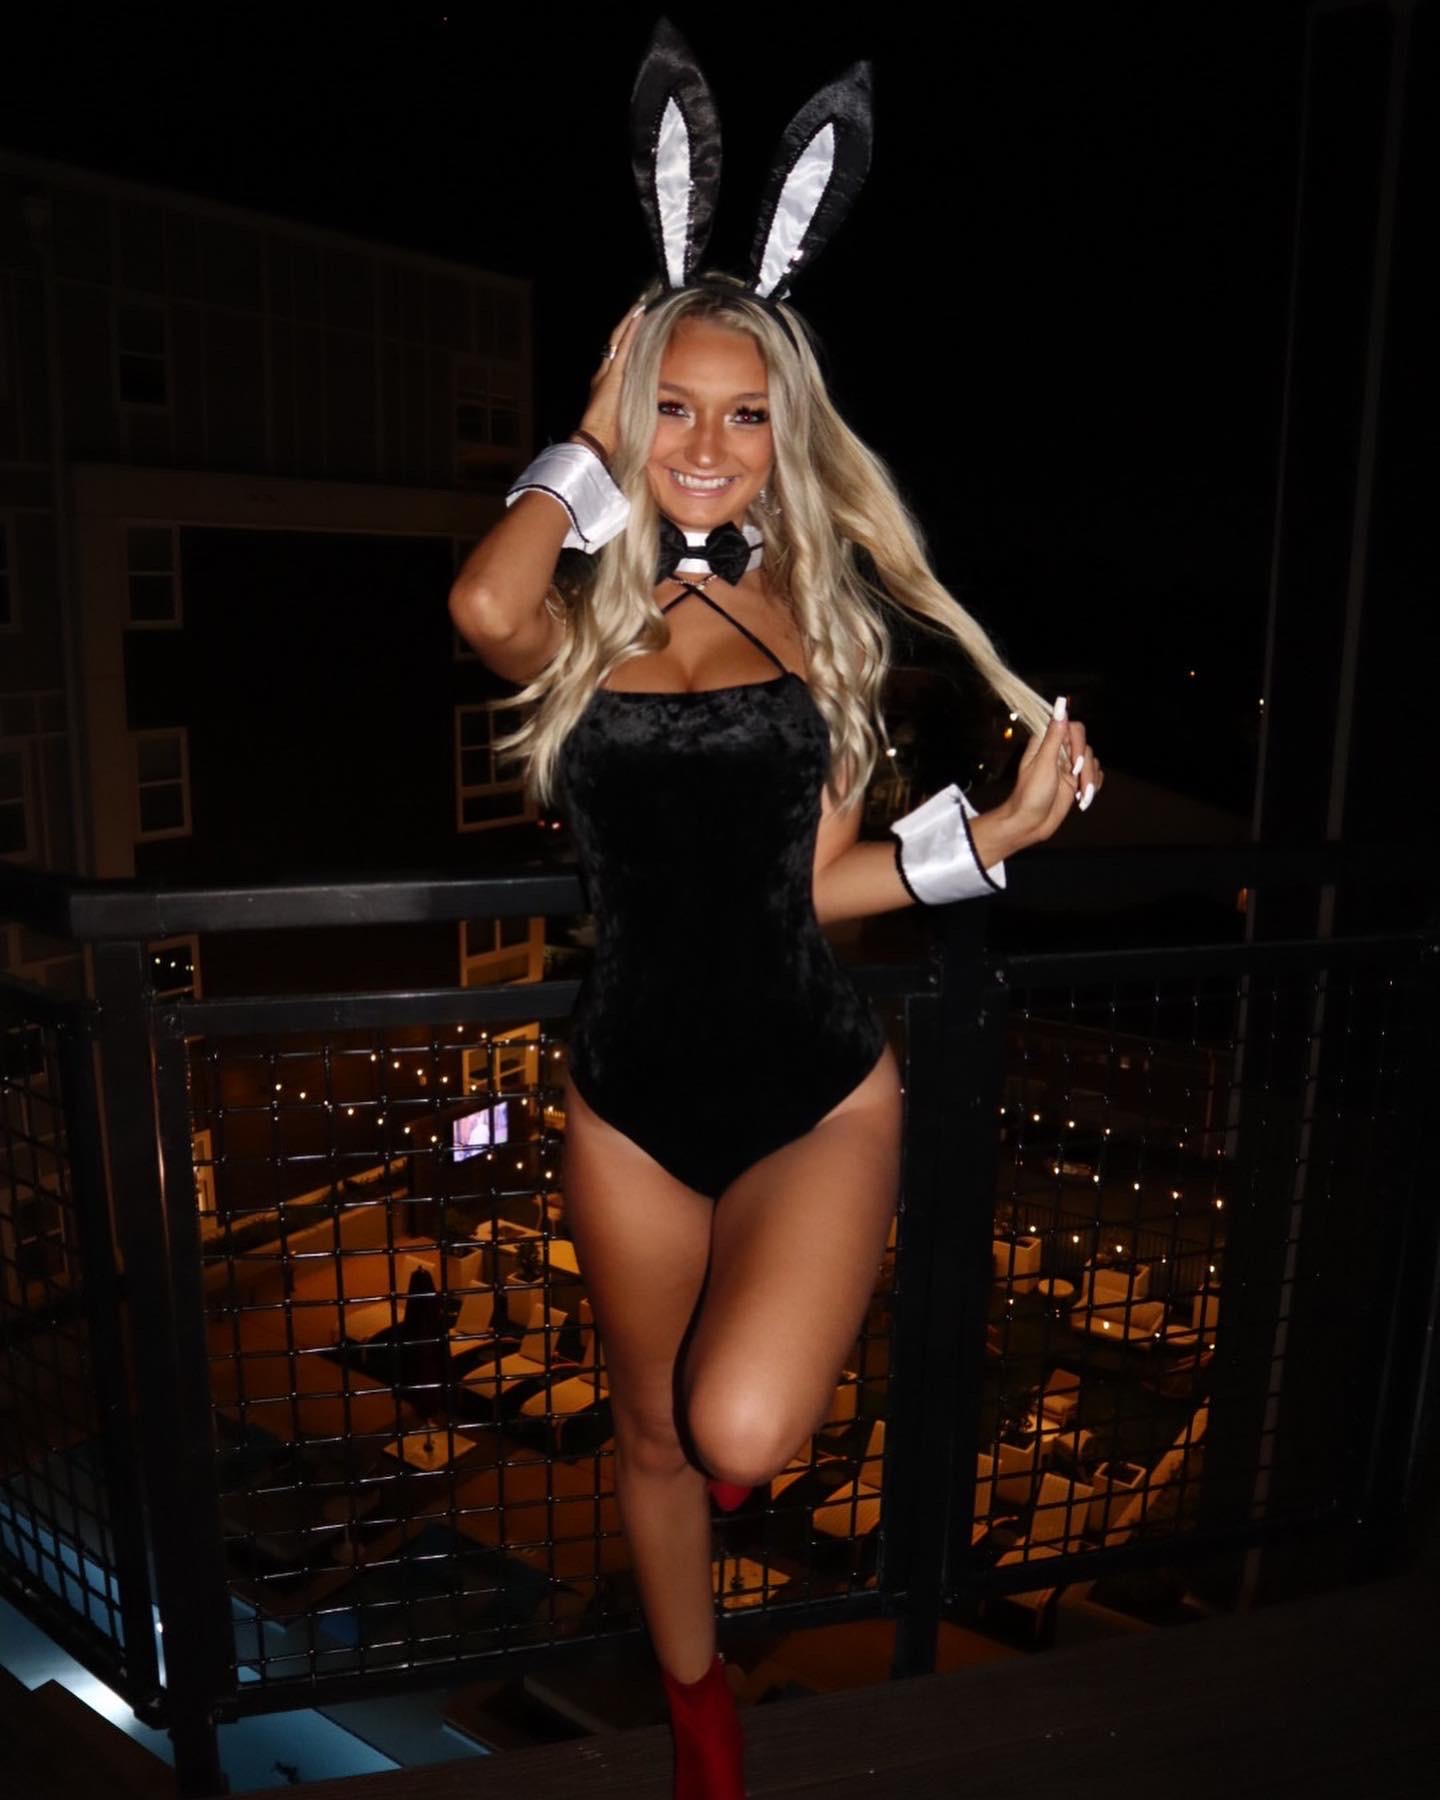 playboy costume